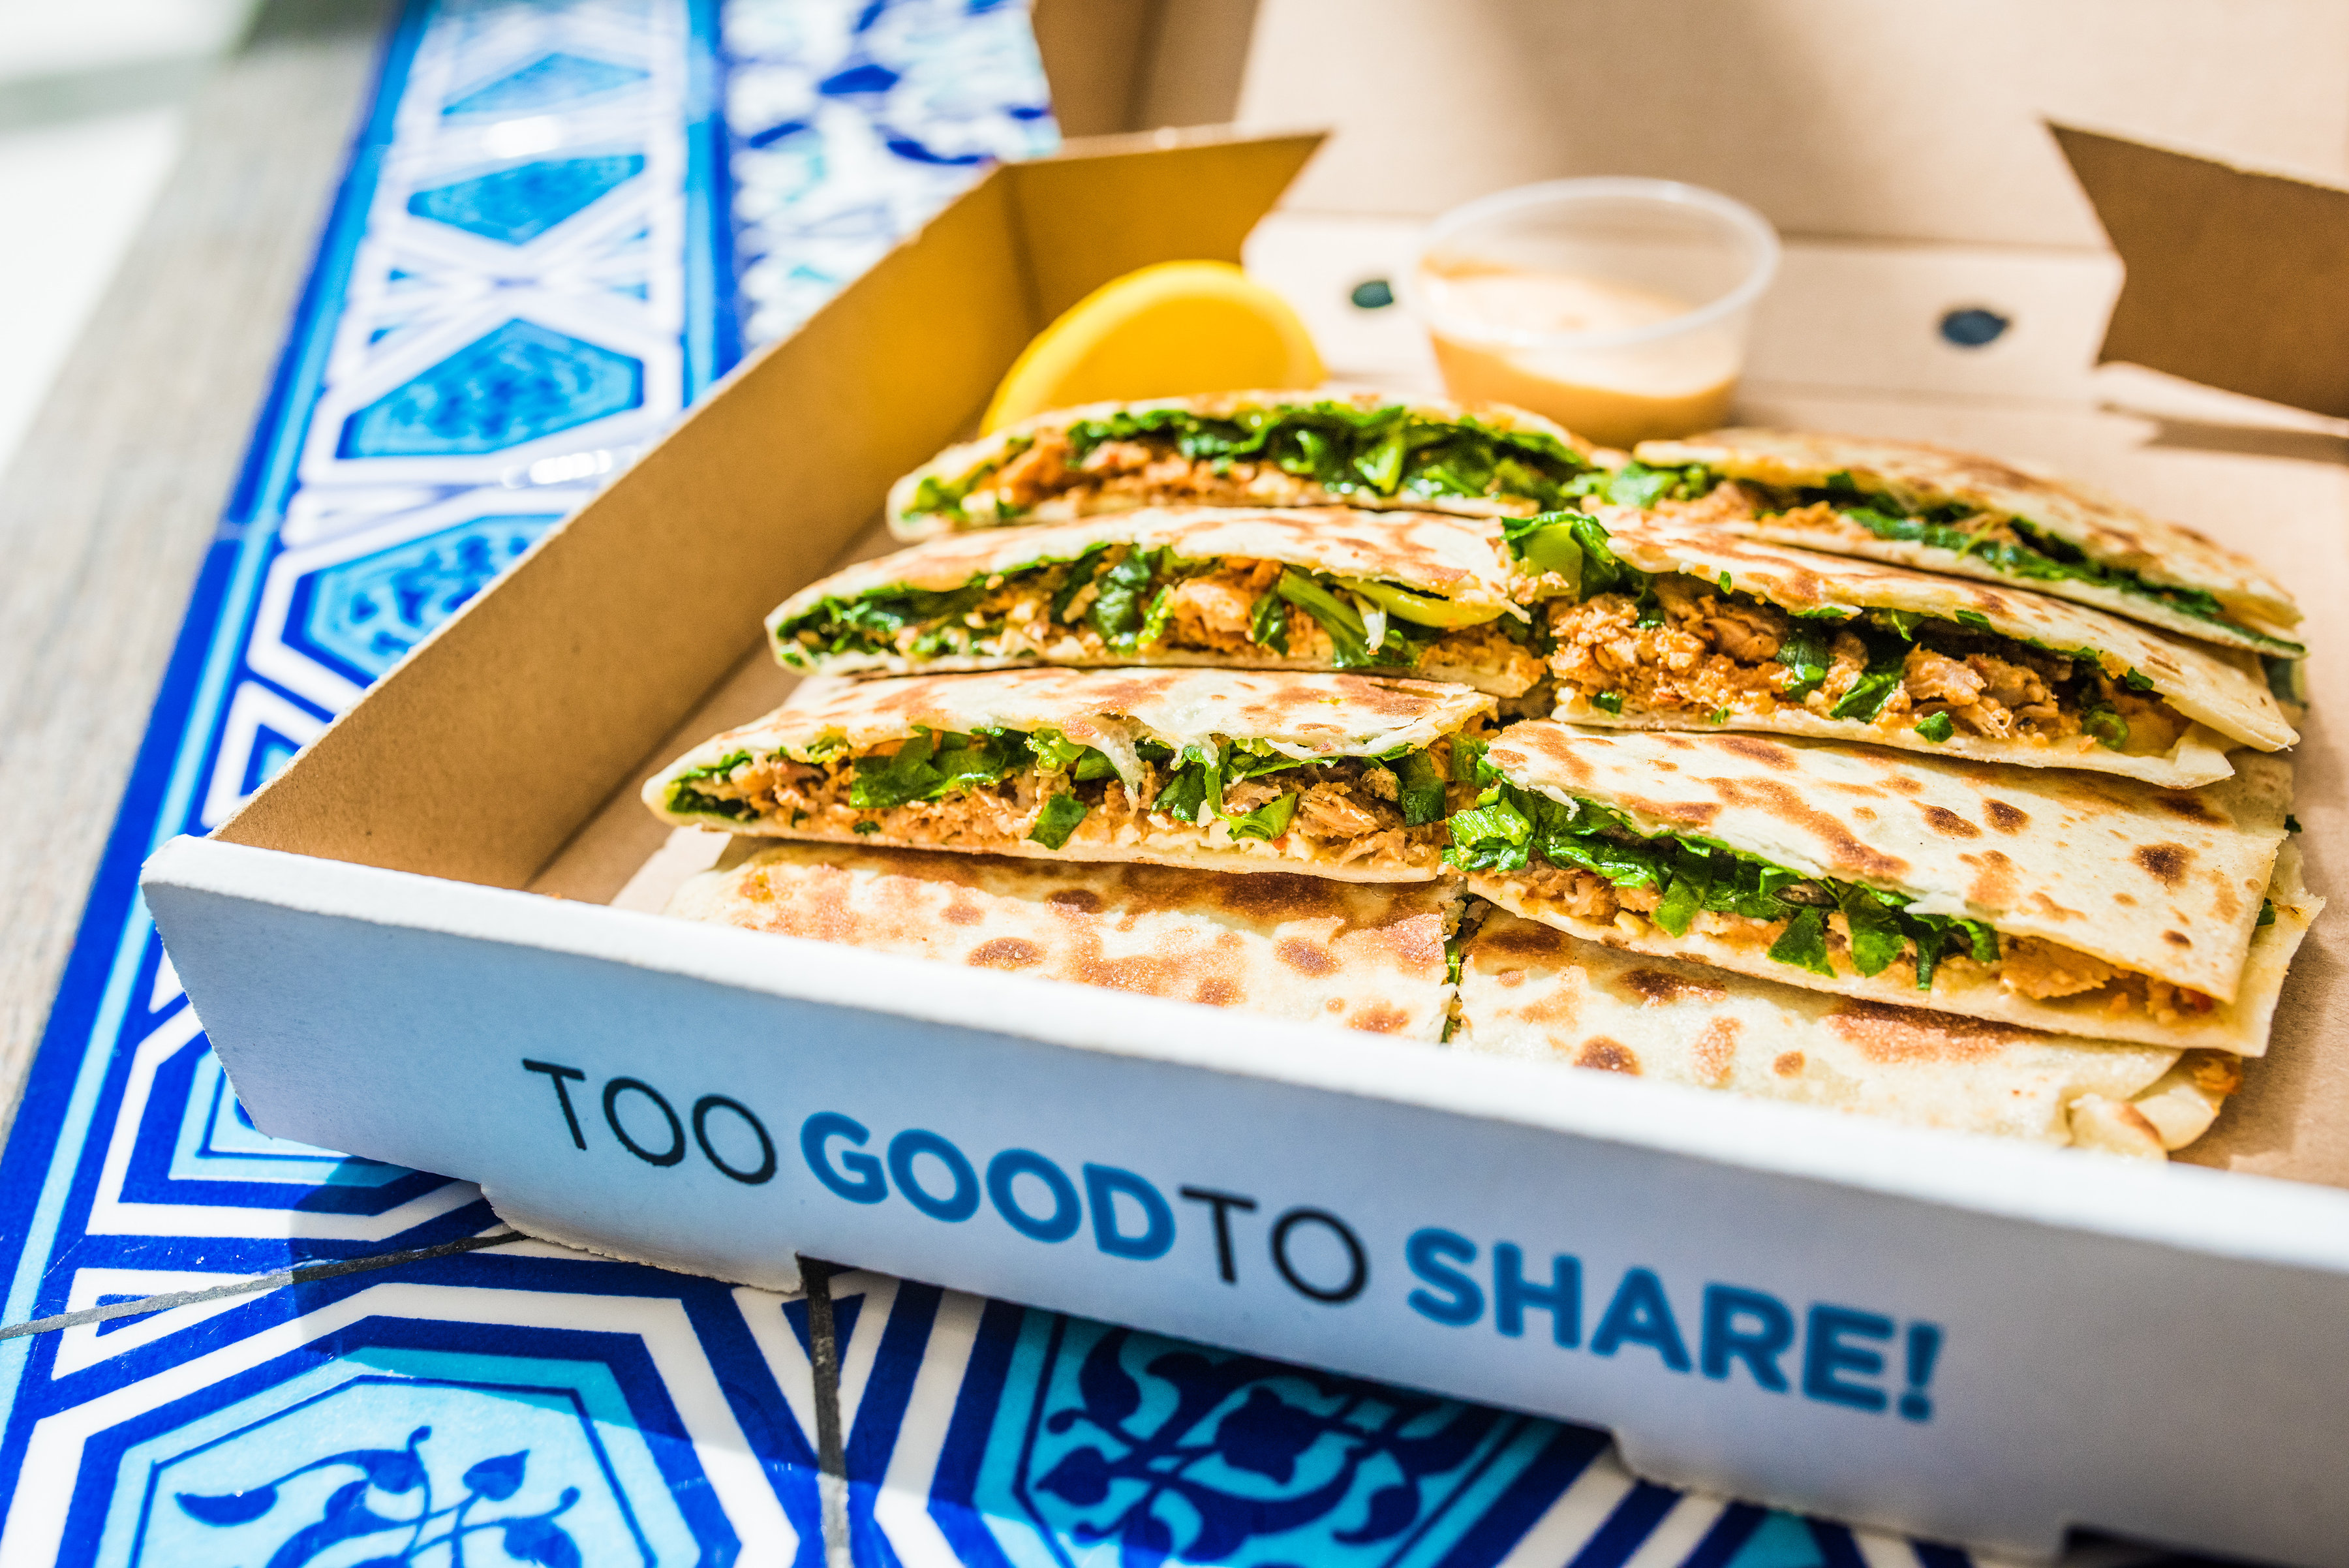 healthy-fresh-fast-gozleme-king-australias-premier-turkish-street-food-0